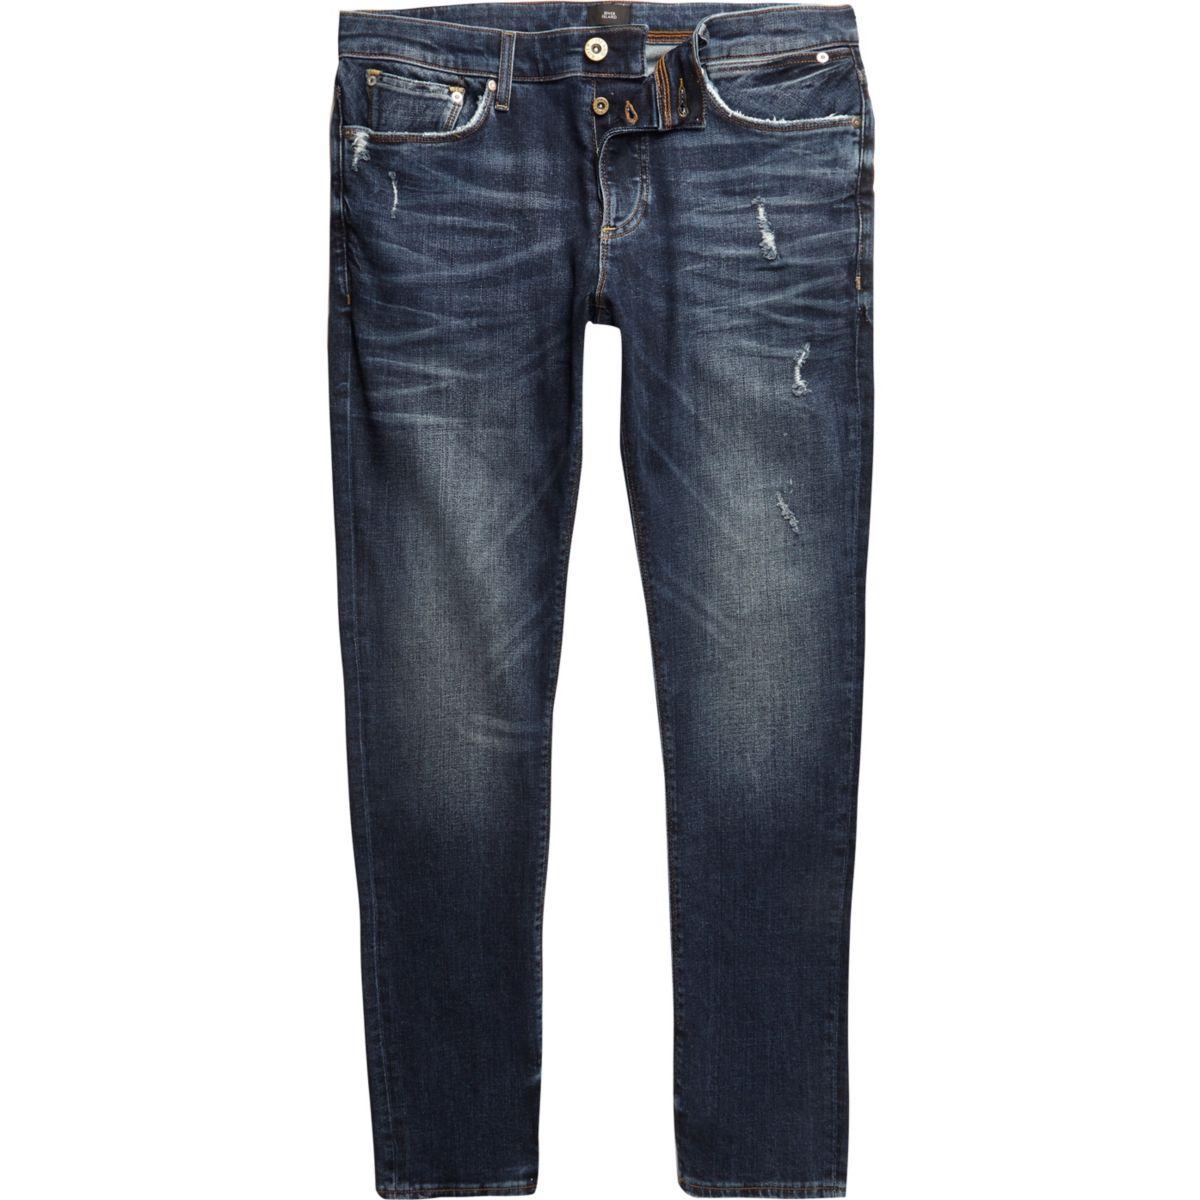 Dark blue wash distressed Sid skinny jeans - Jeans - Sale ... - photo#39